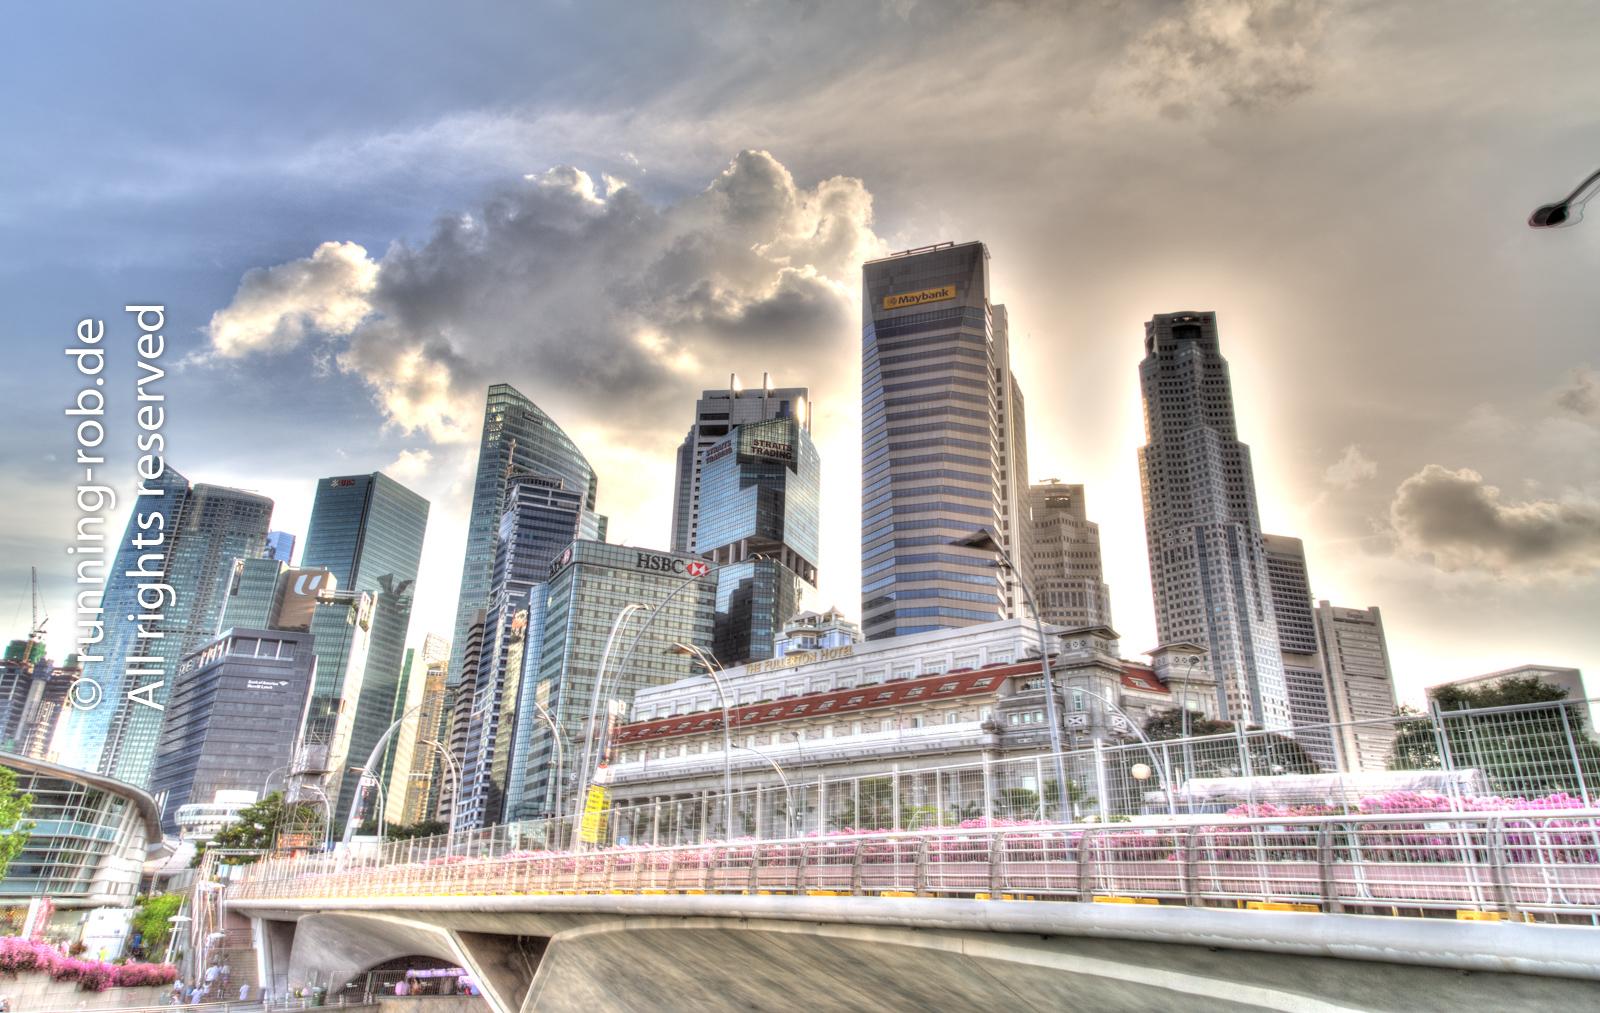 Singapurs Marina Bay Skyline mit den Bankentowern in HDR.